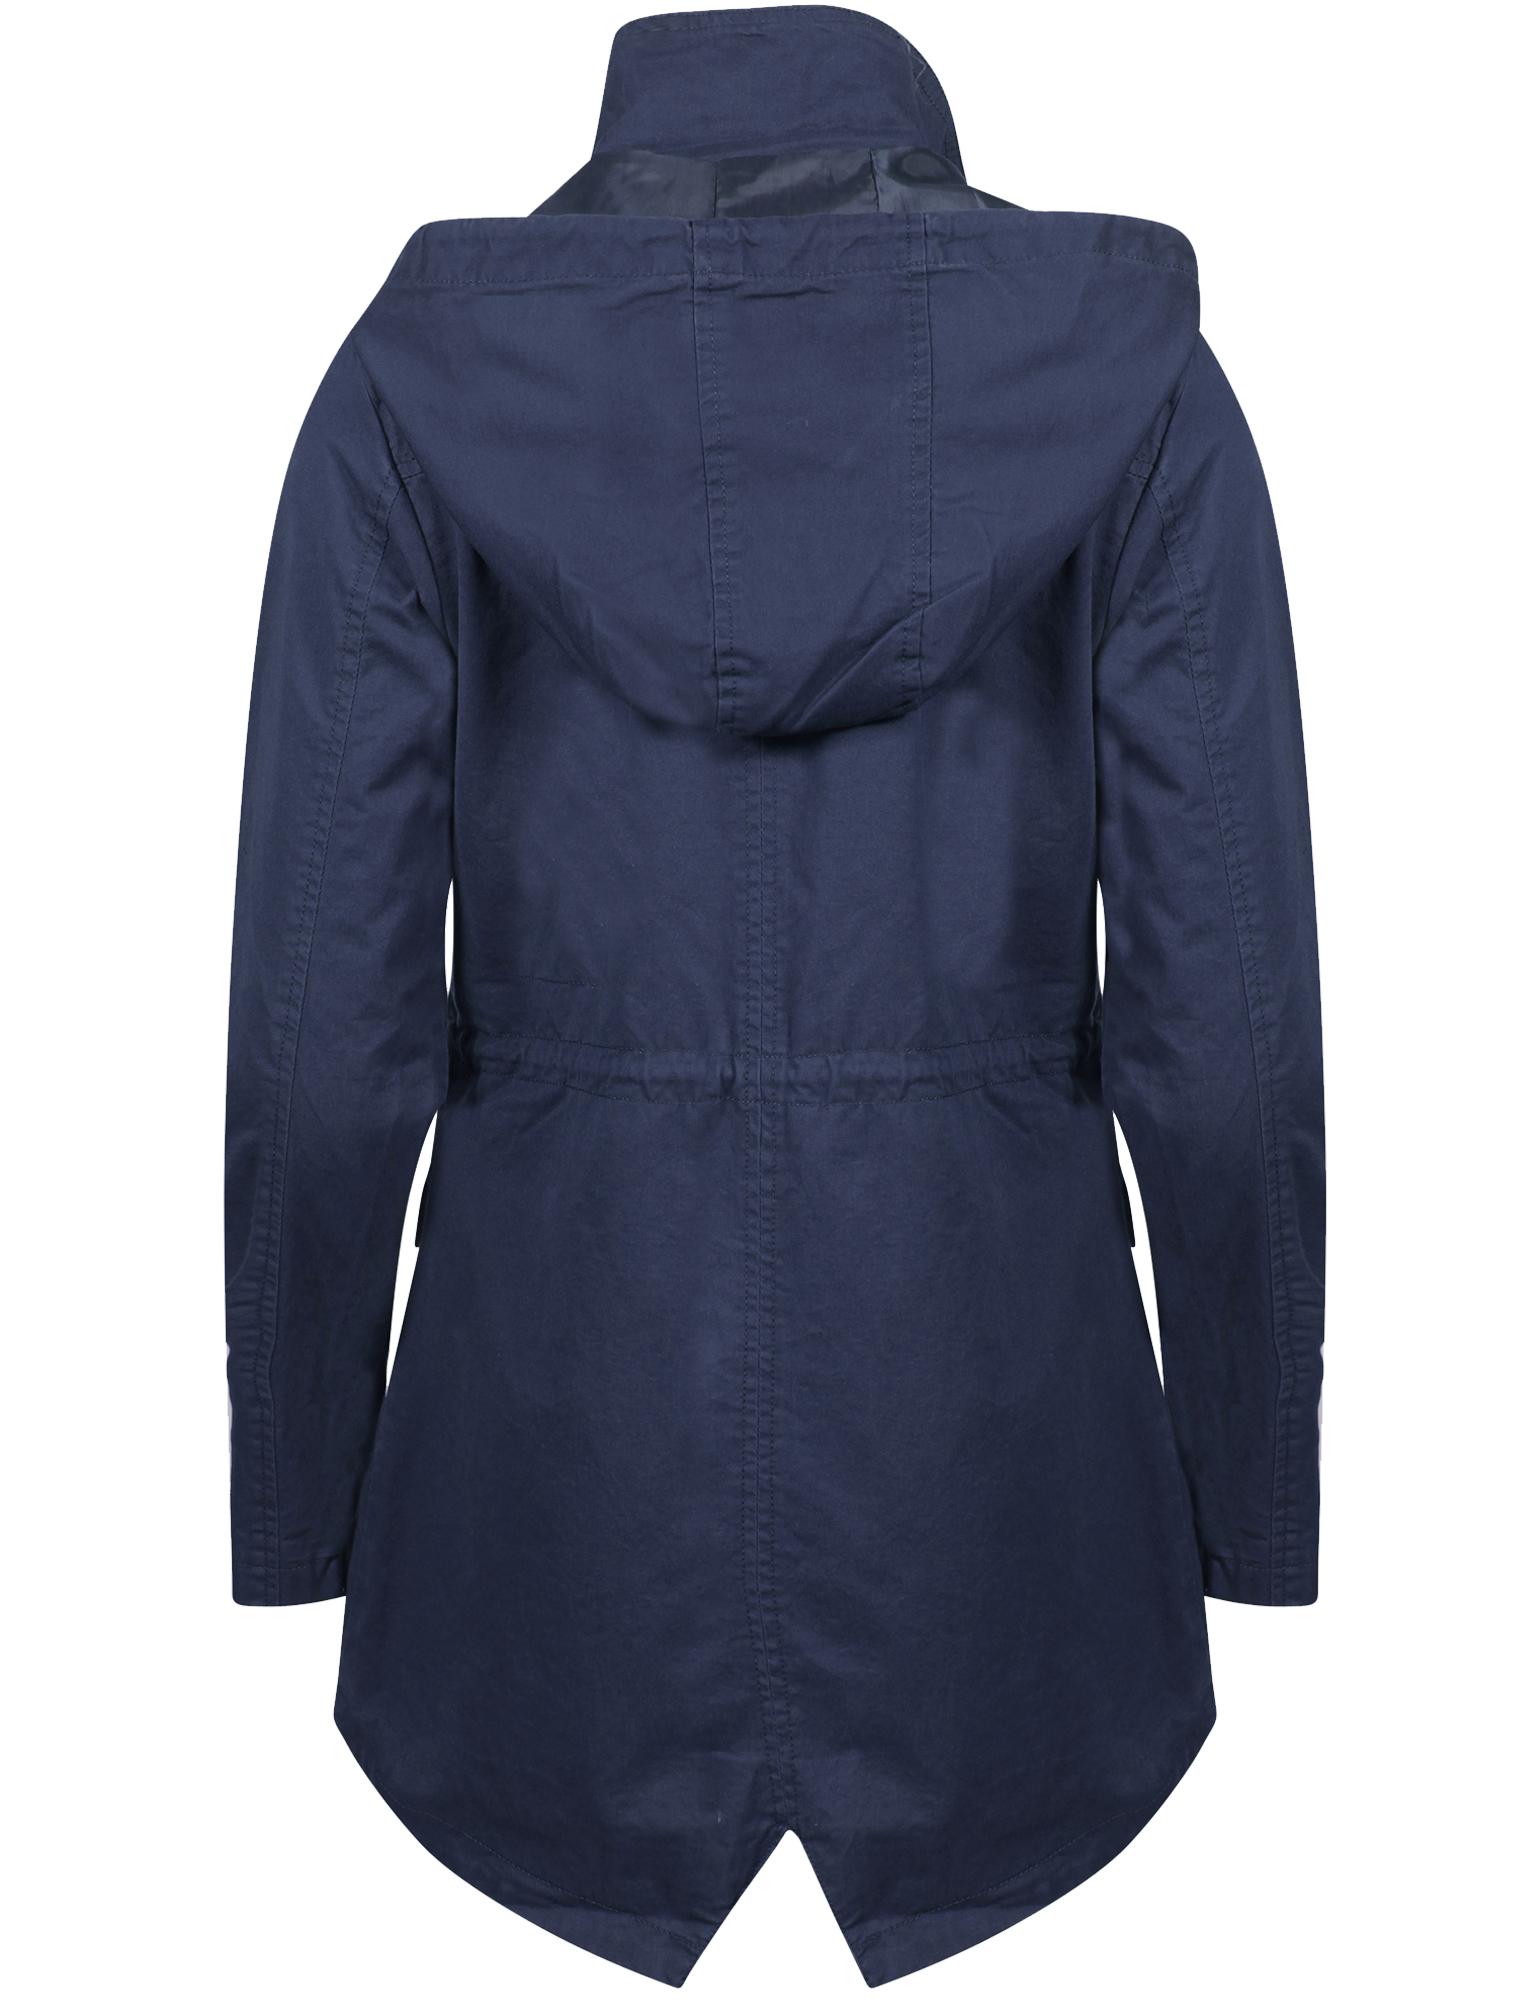 Womens-Tokyo-Laundry-Latitude-Cotton-Hooded-Light-Weight-Parka-Jacket-Size-8-16 thumbnail 3